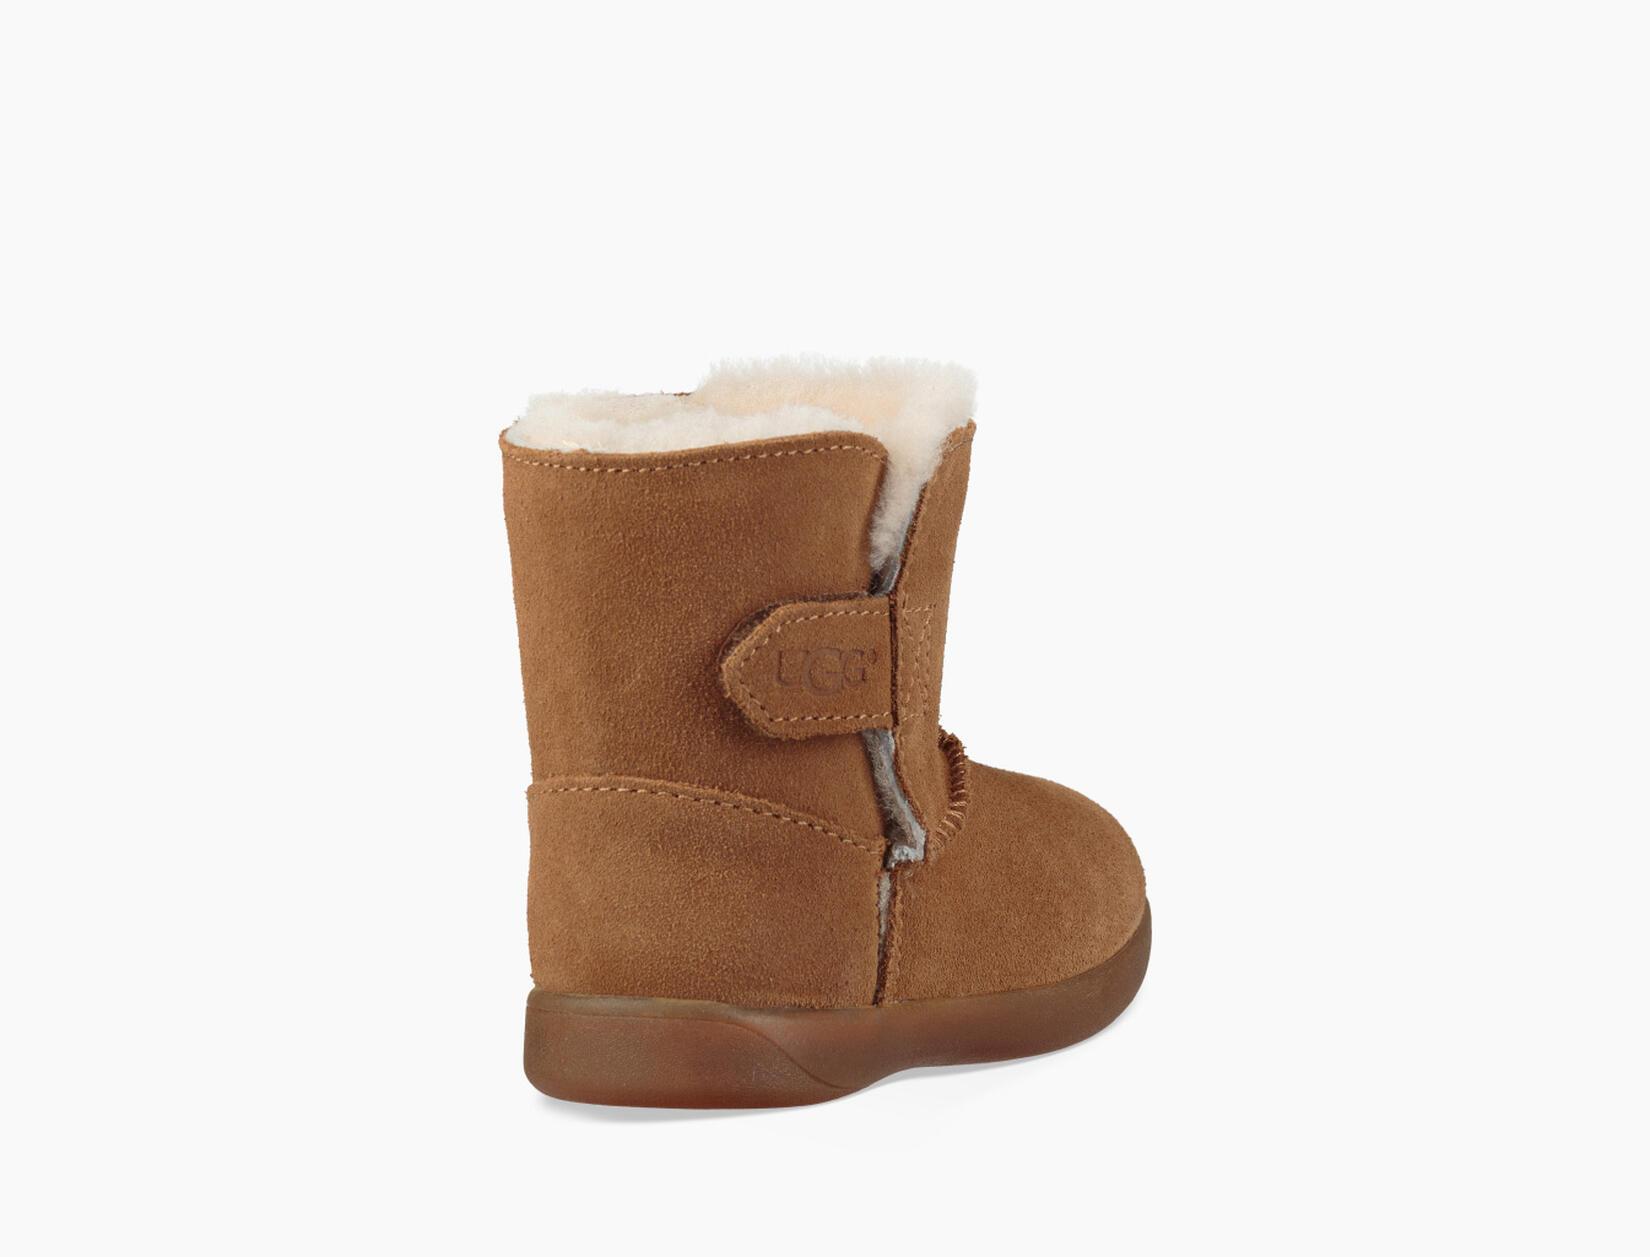 Keelan Ankle Boot